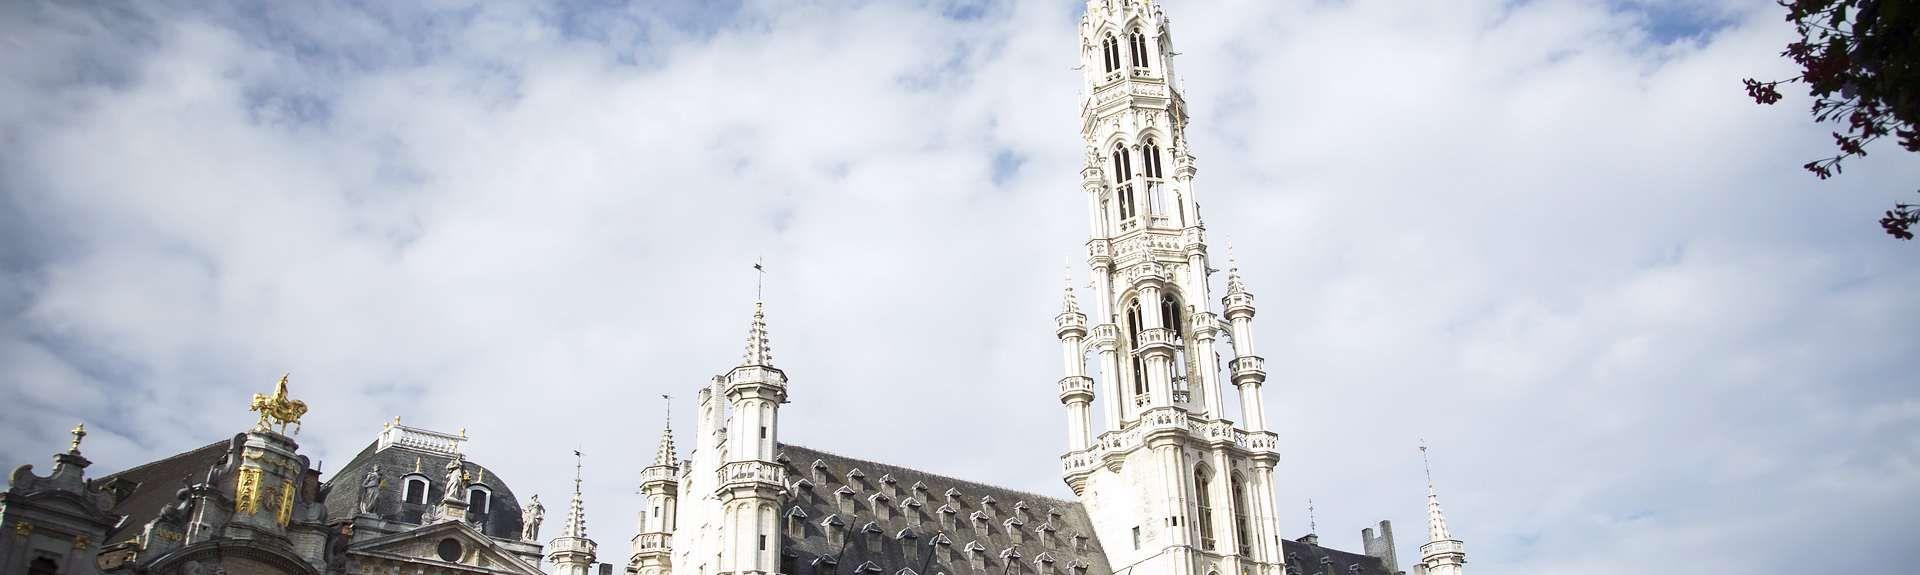 Dansaert, Brussels, Brussels-Capital Region, Belgium